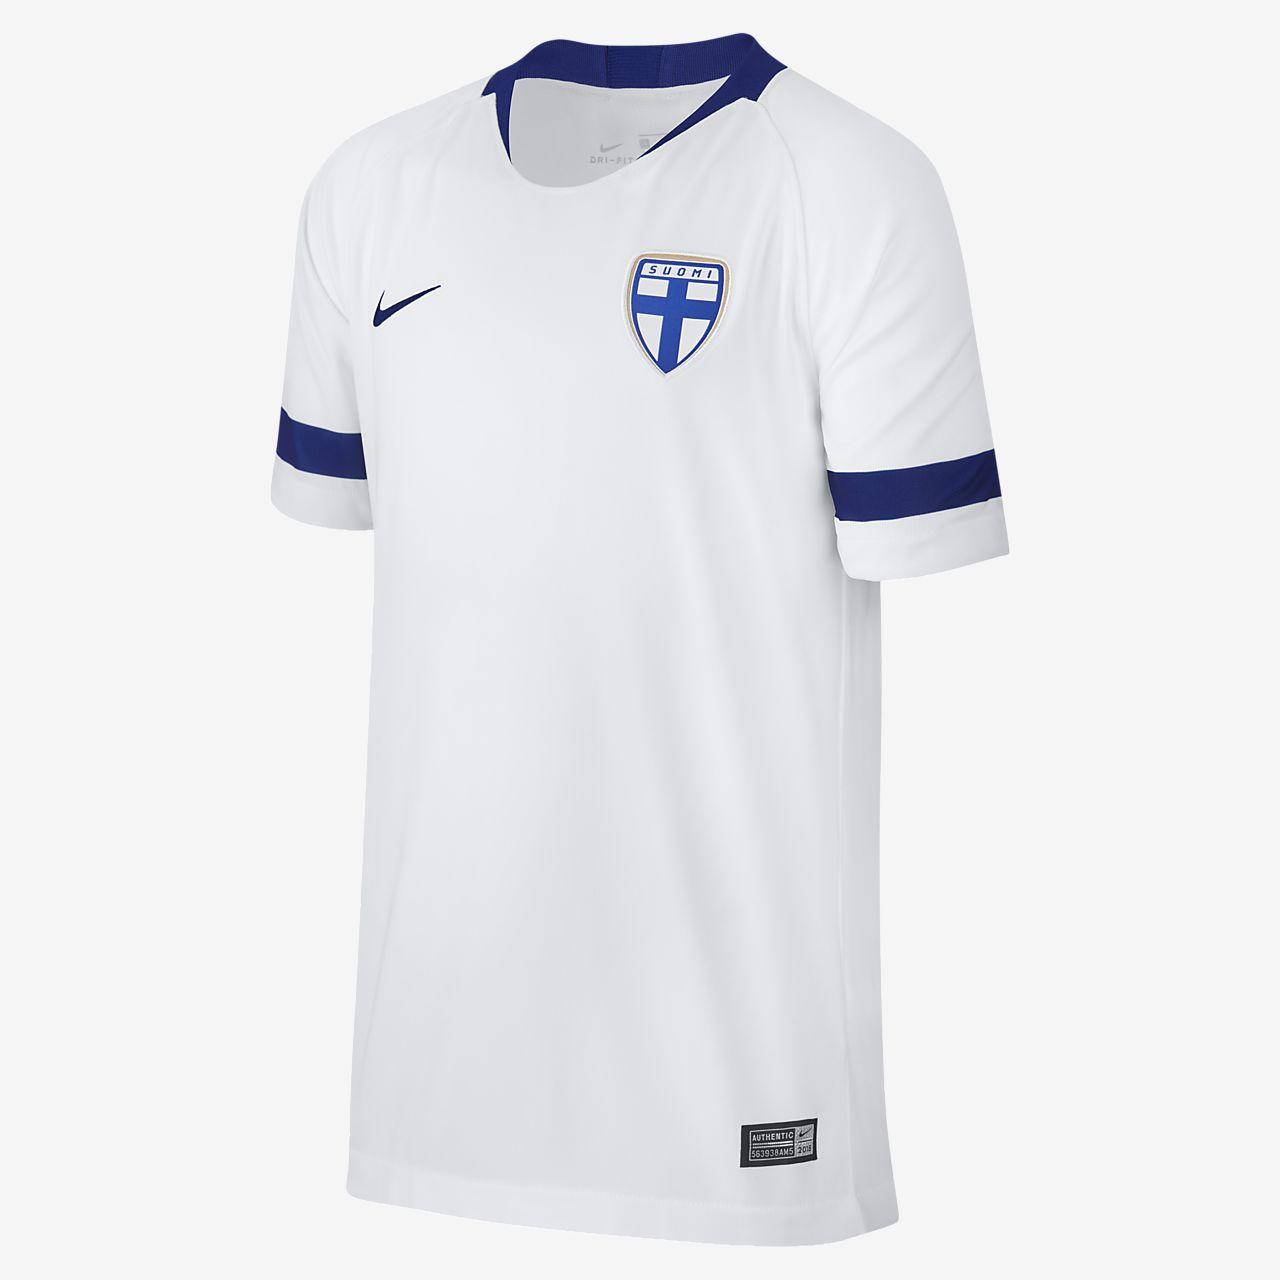 Camiseta de fútbol para niños talla grande 2018 Finland Stadium Home